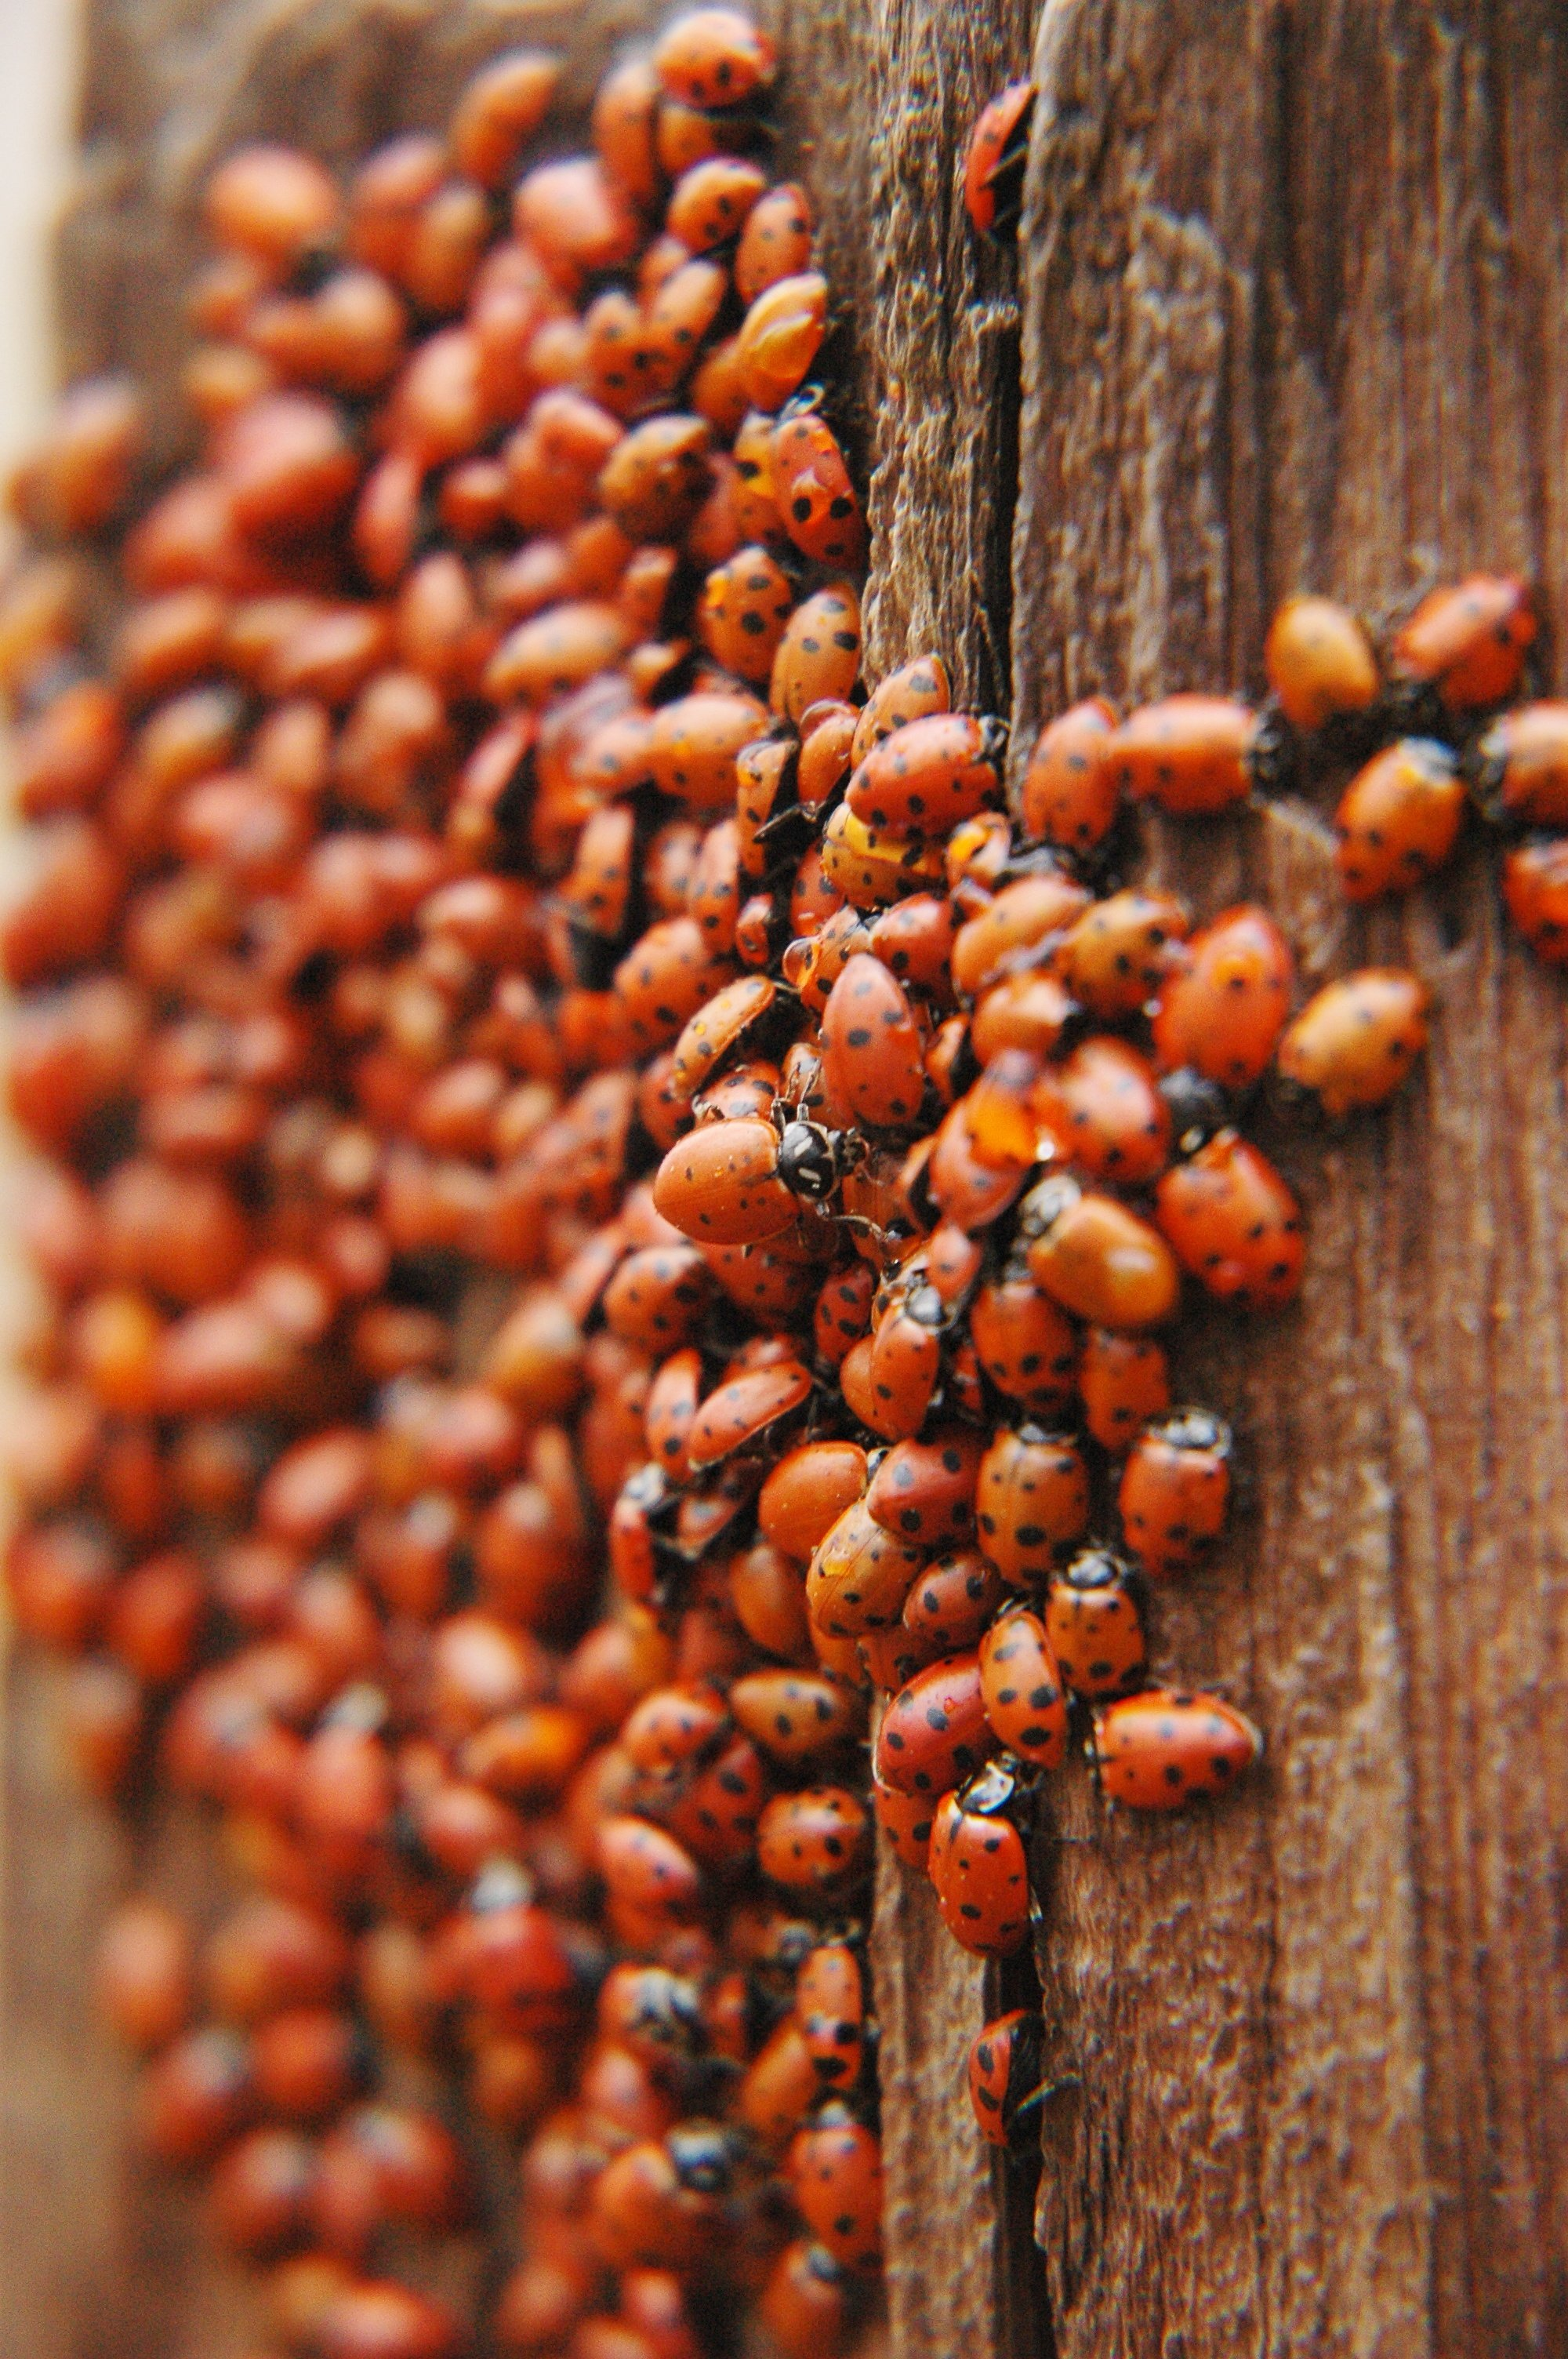 asian-lady-beetle-swarm.jpg